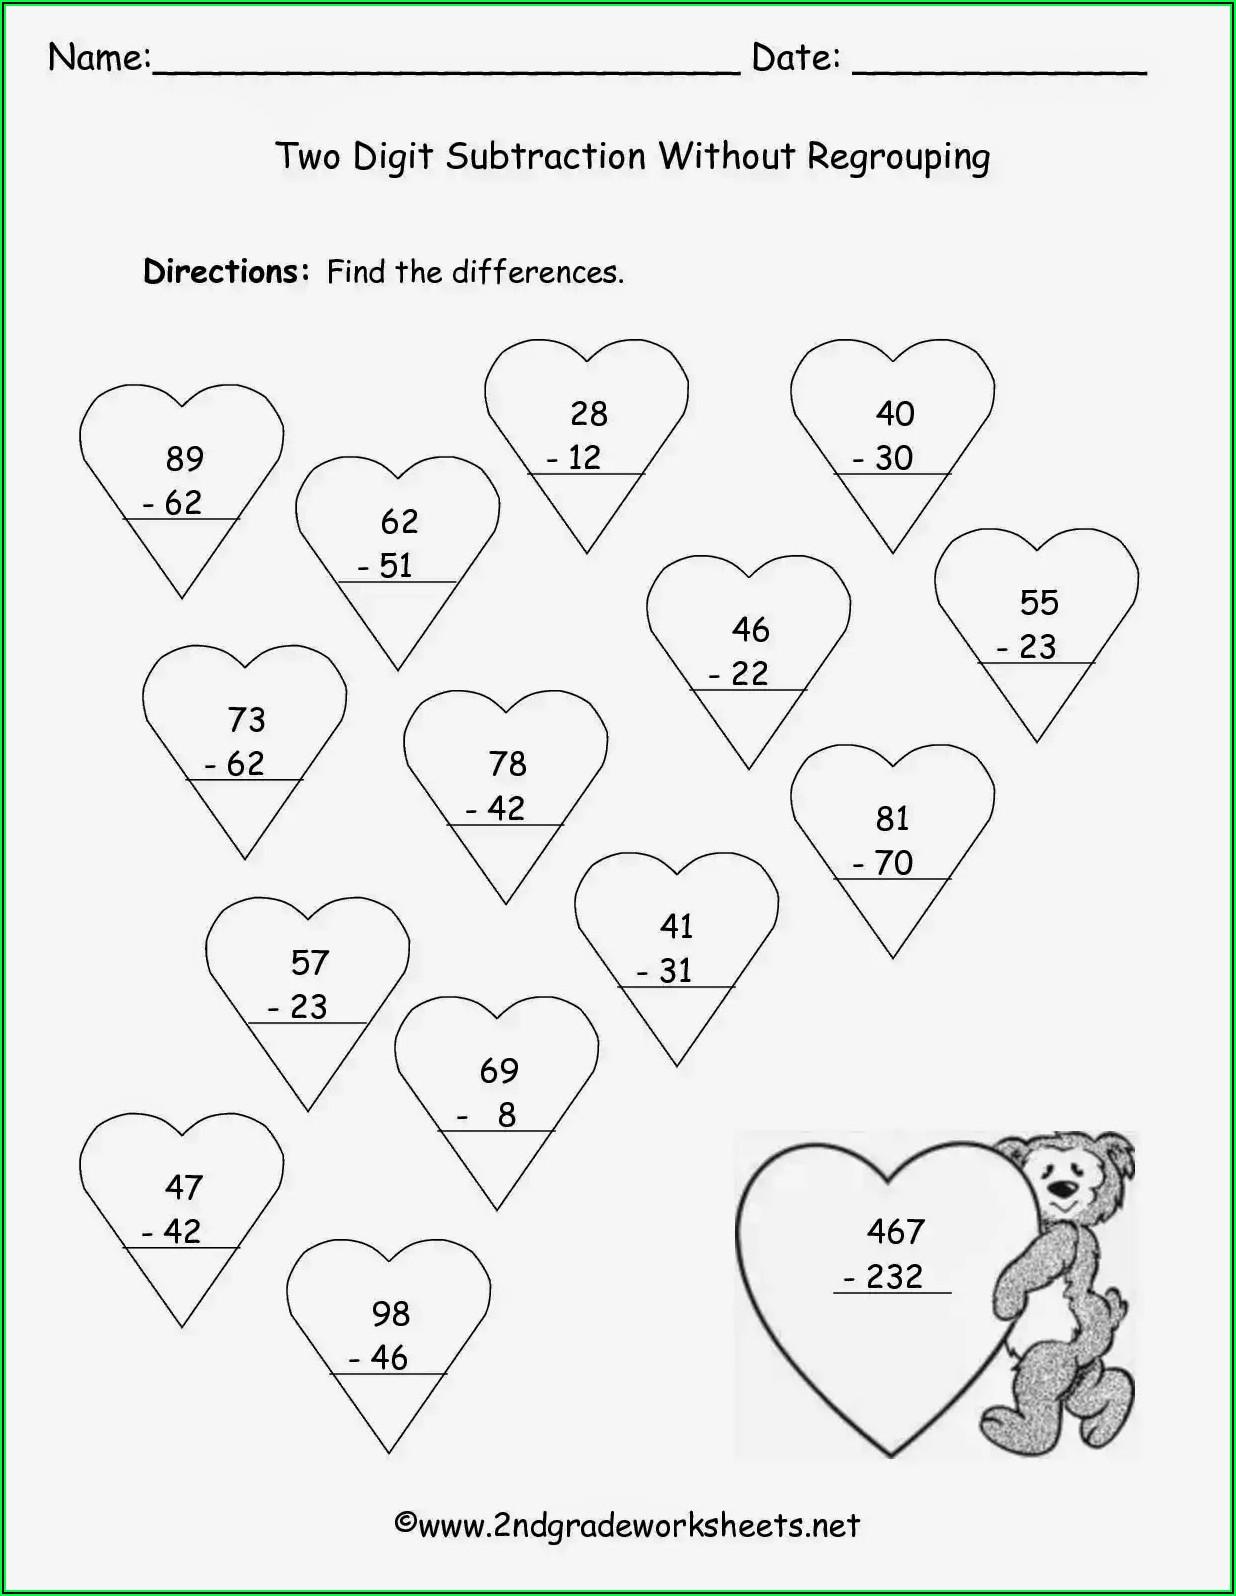 Multiplication Word Problems Worksheets For 2nd Grade